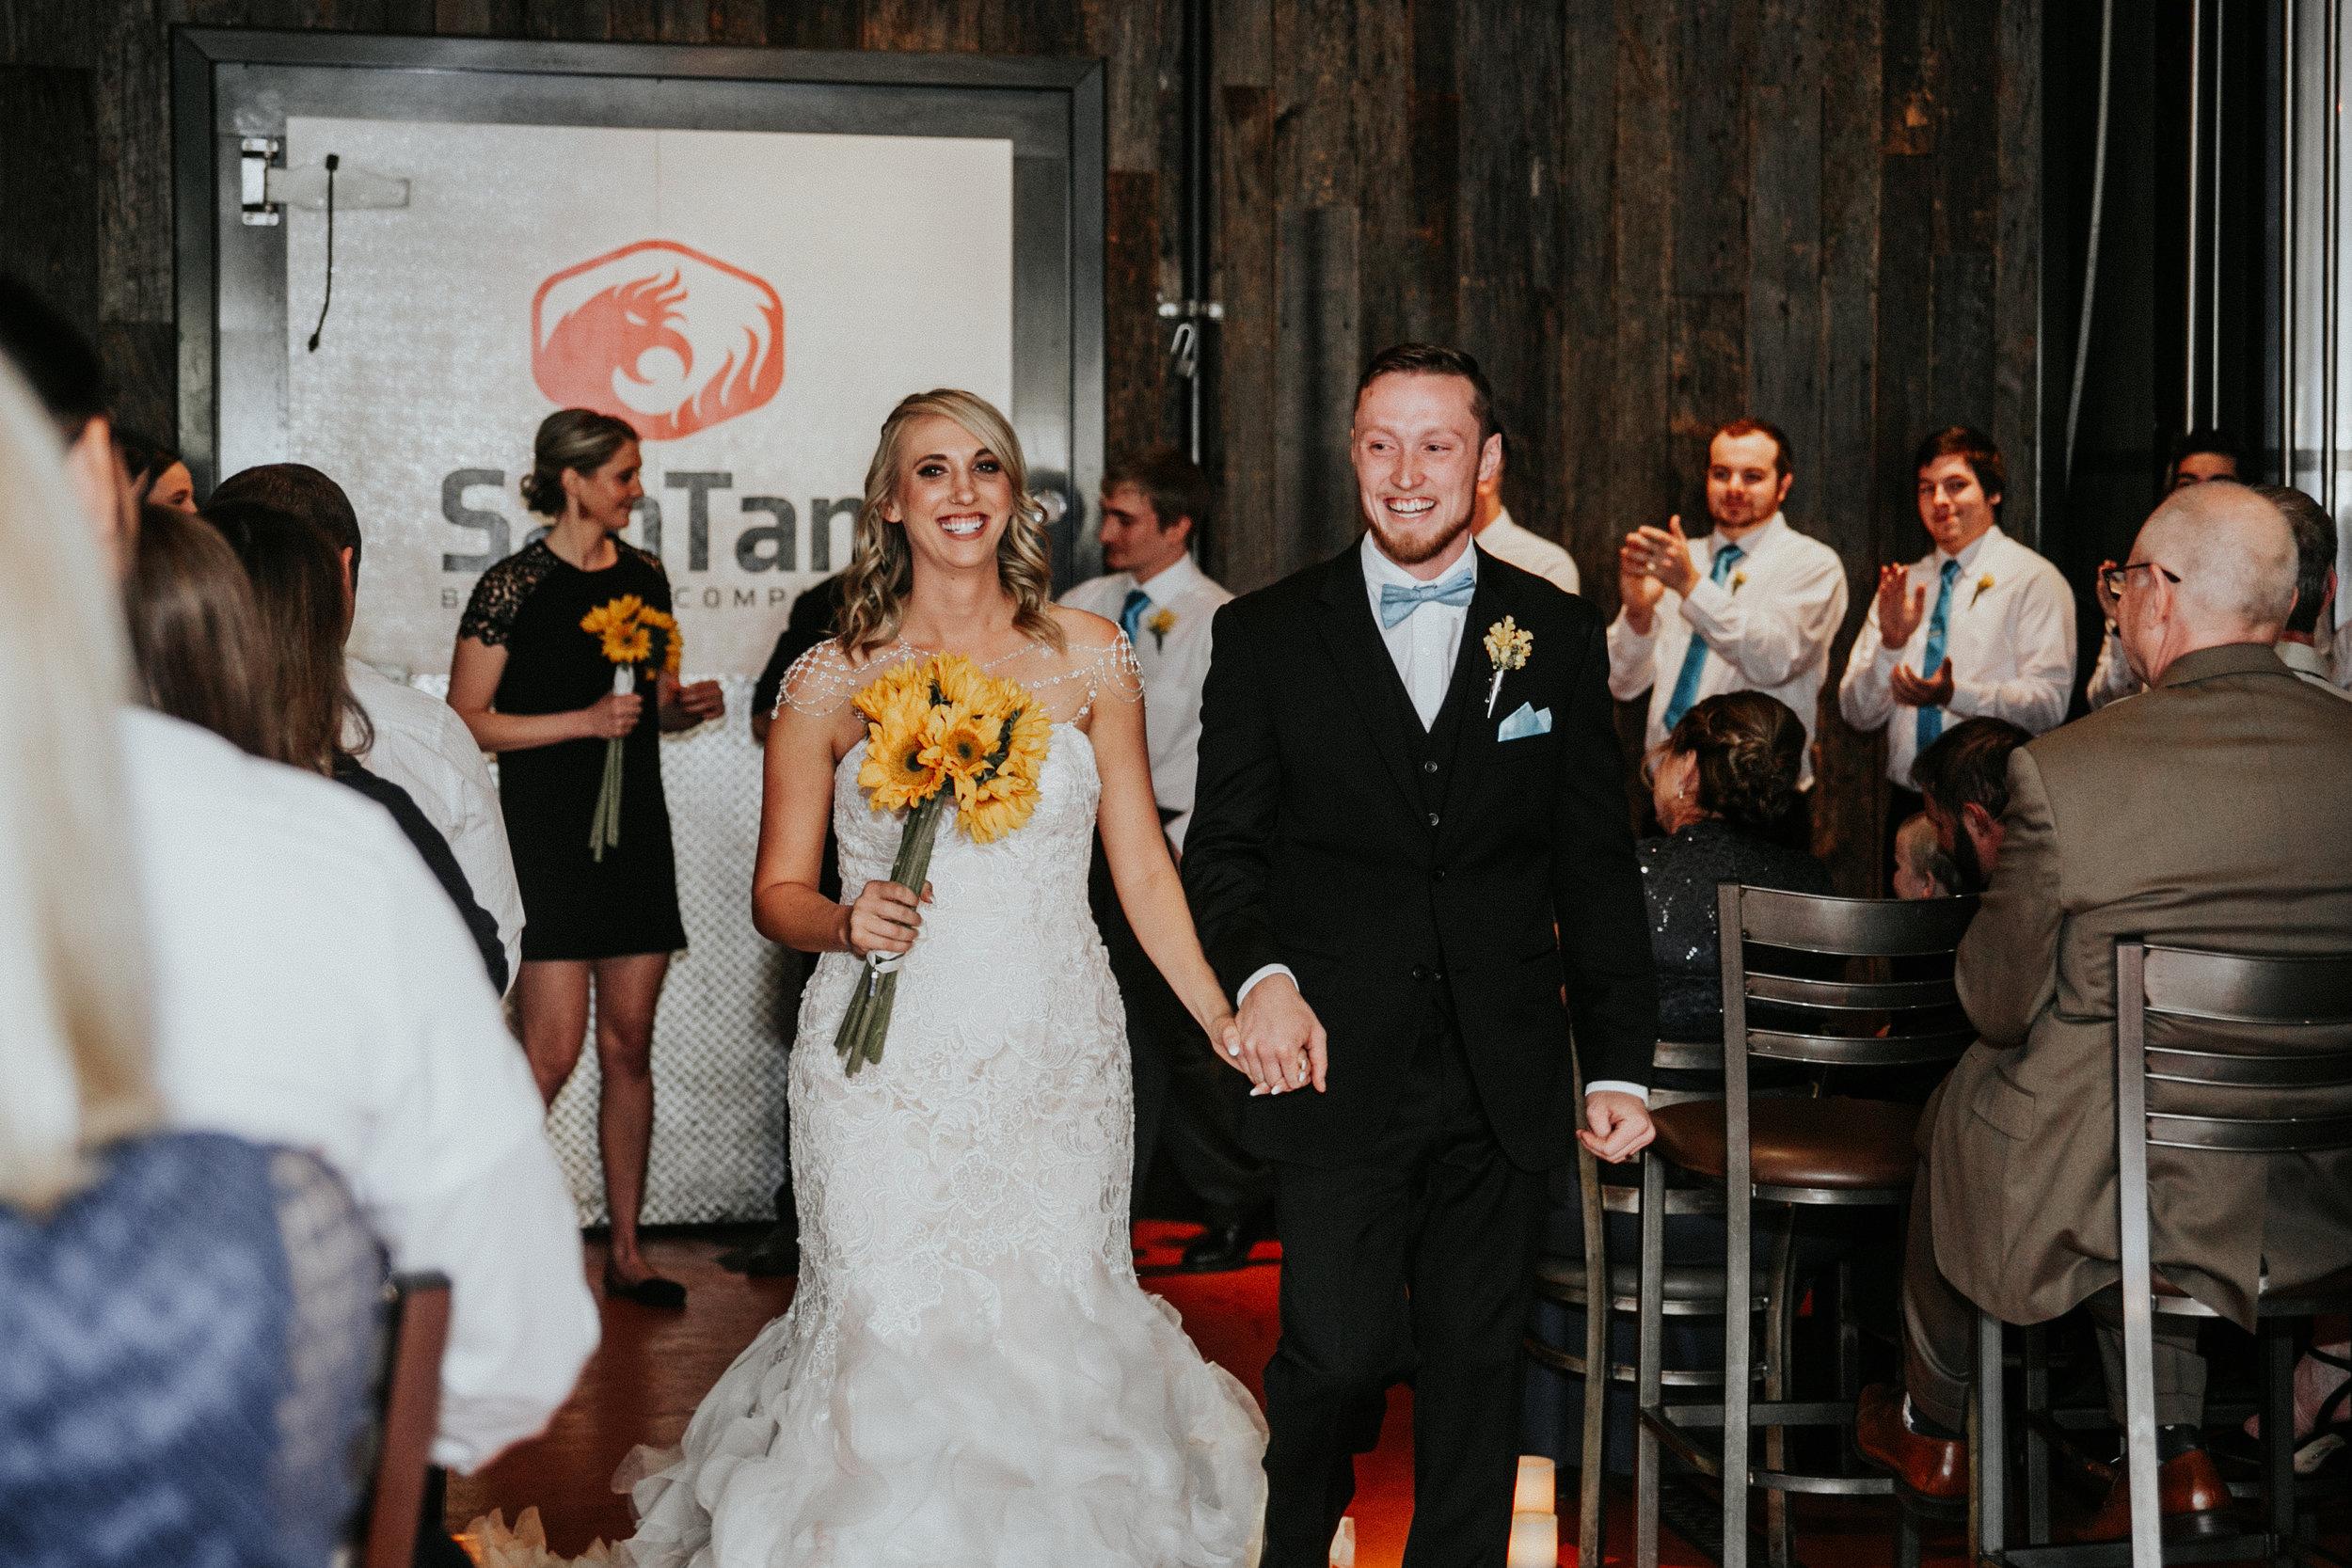 adventure-wedding-photographer-gracetphotography-29.jpg